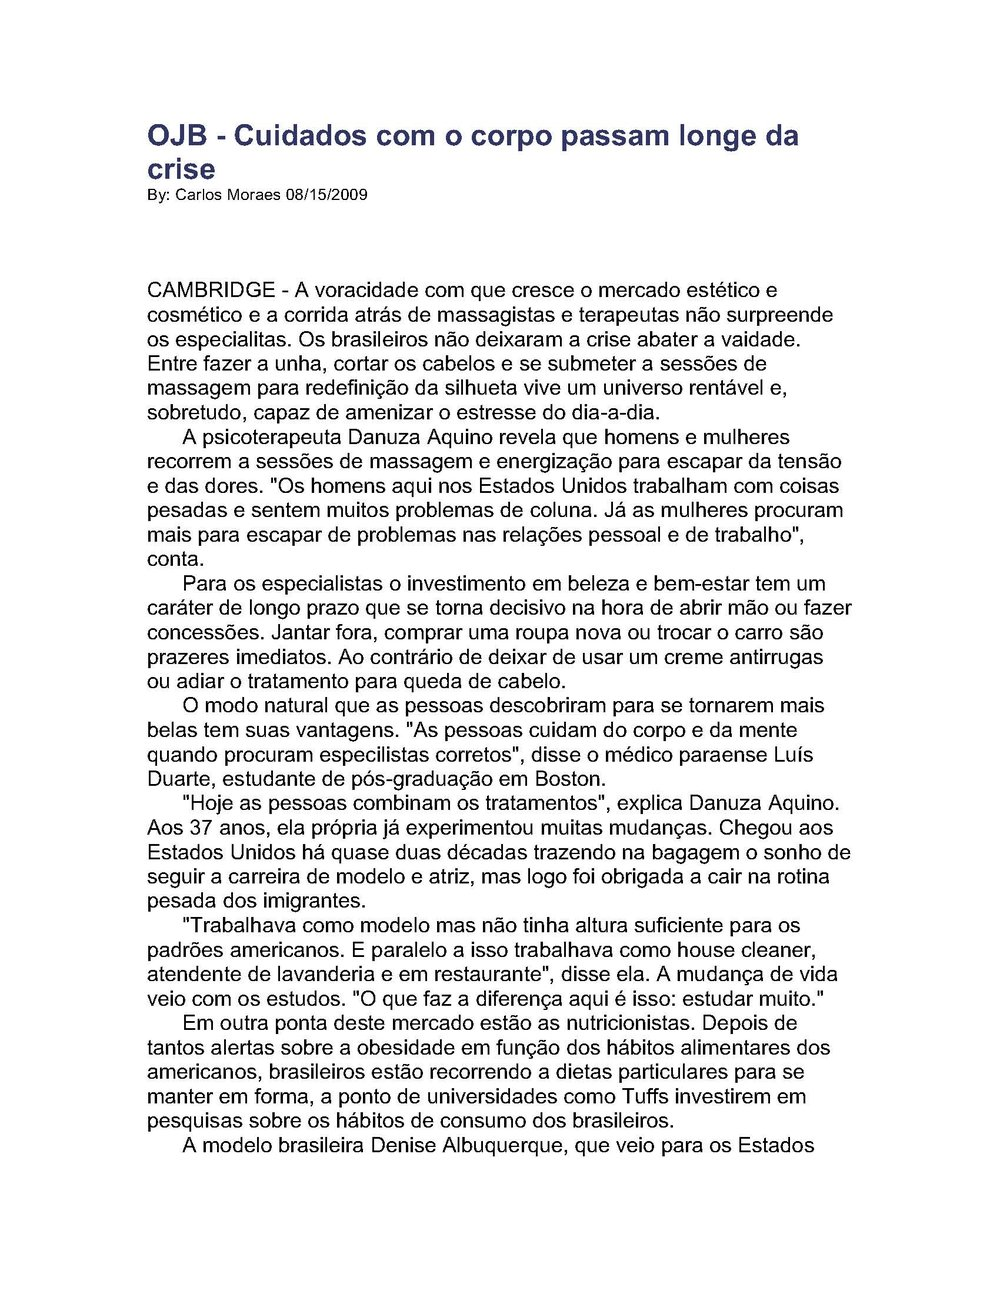 Entrevista para Carlos Morais (O Jornal)_Page_1.jpg